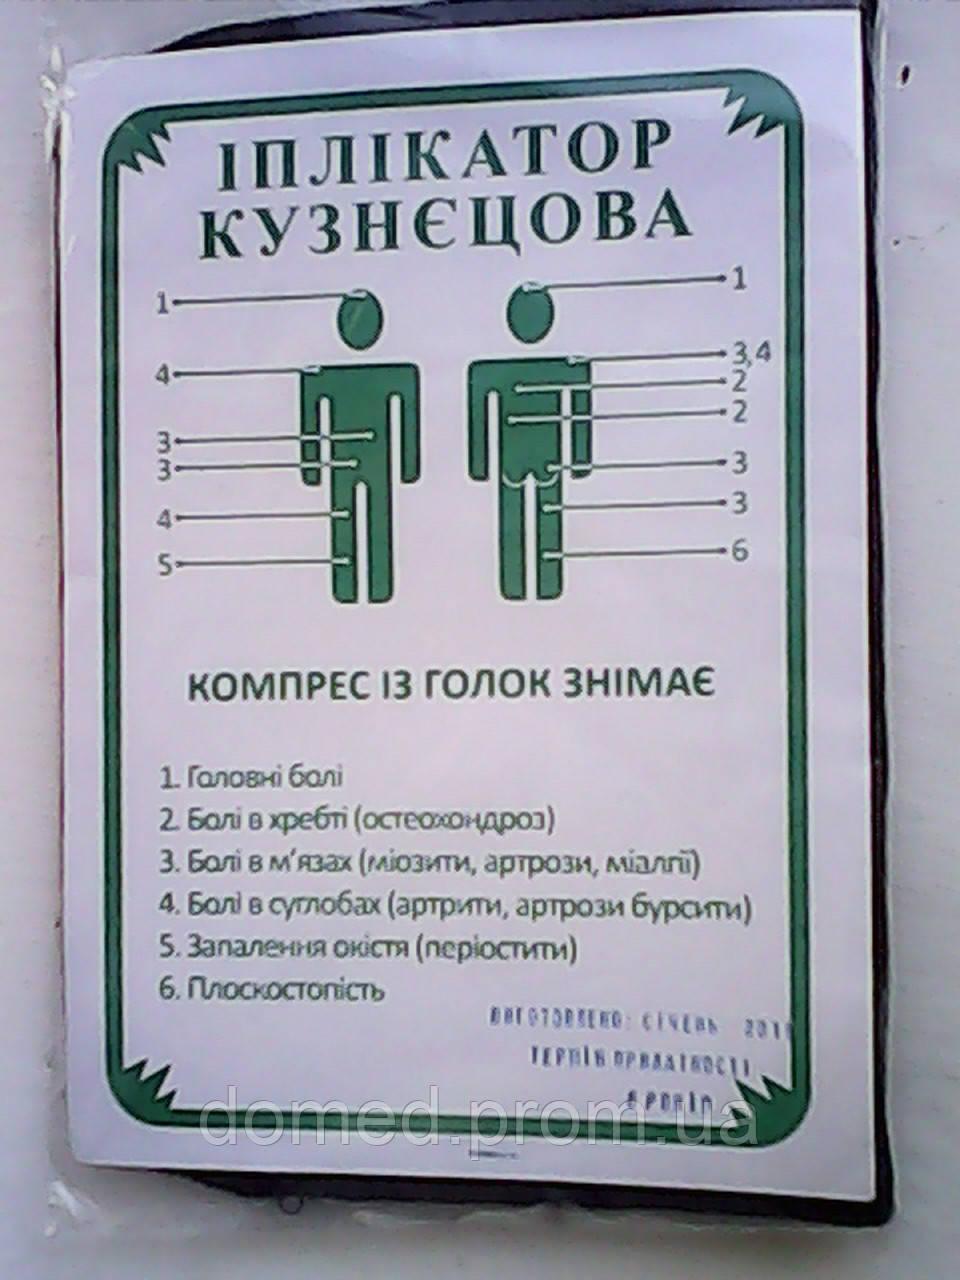 Аппликатор Кузнецова  56 шт.